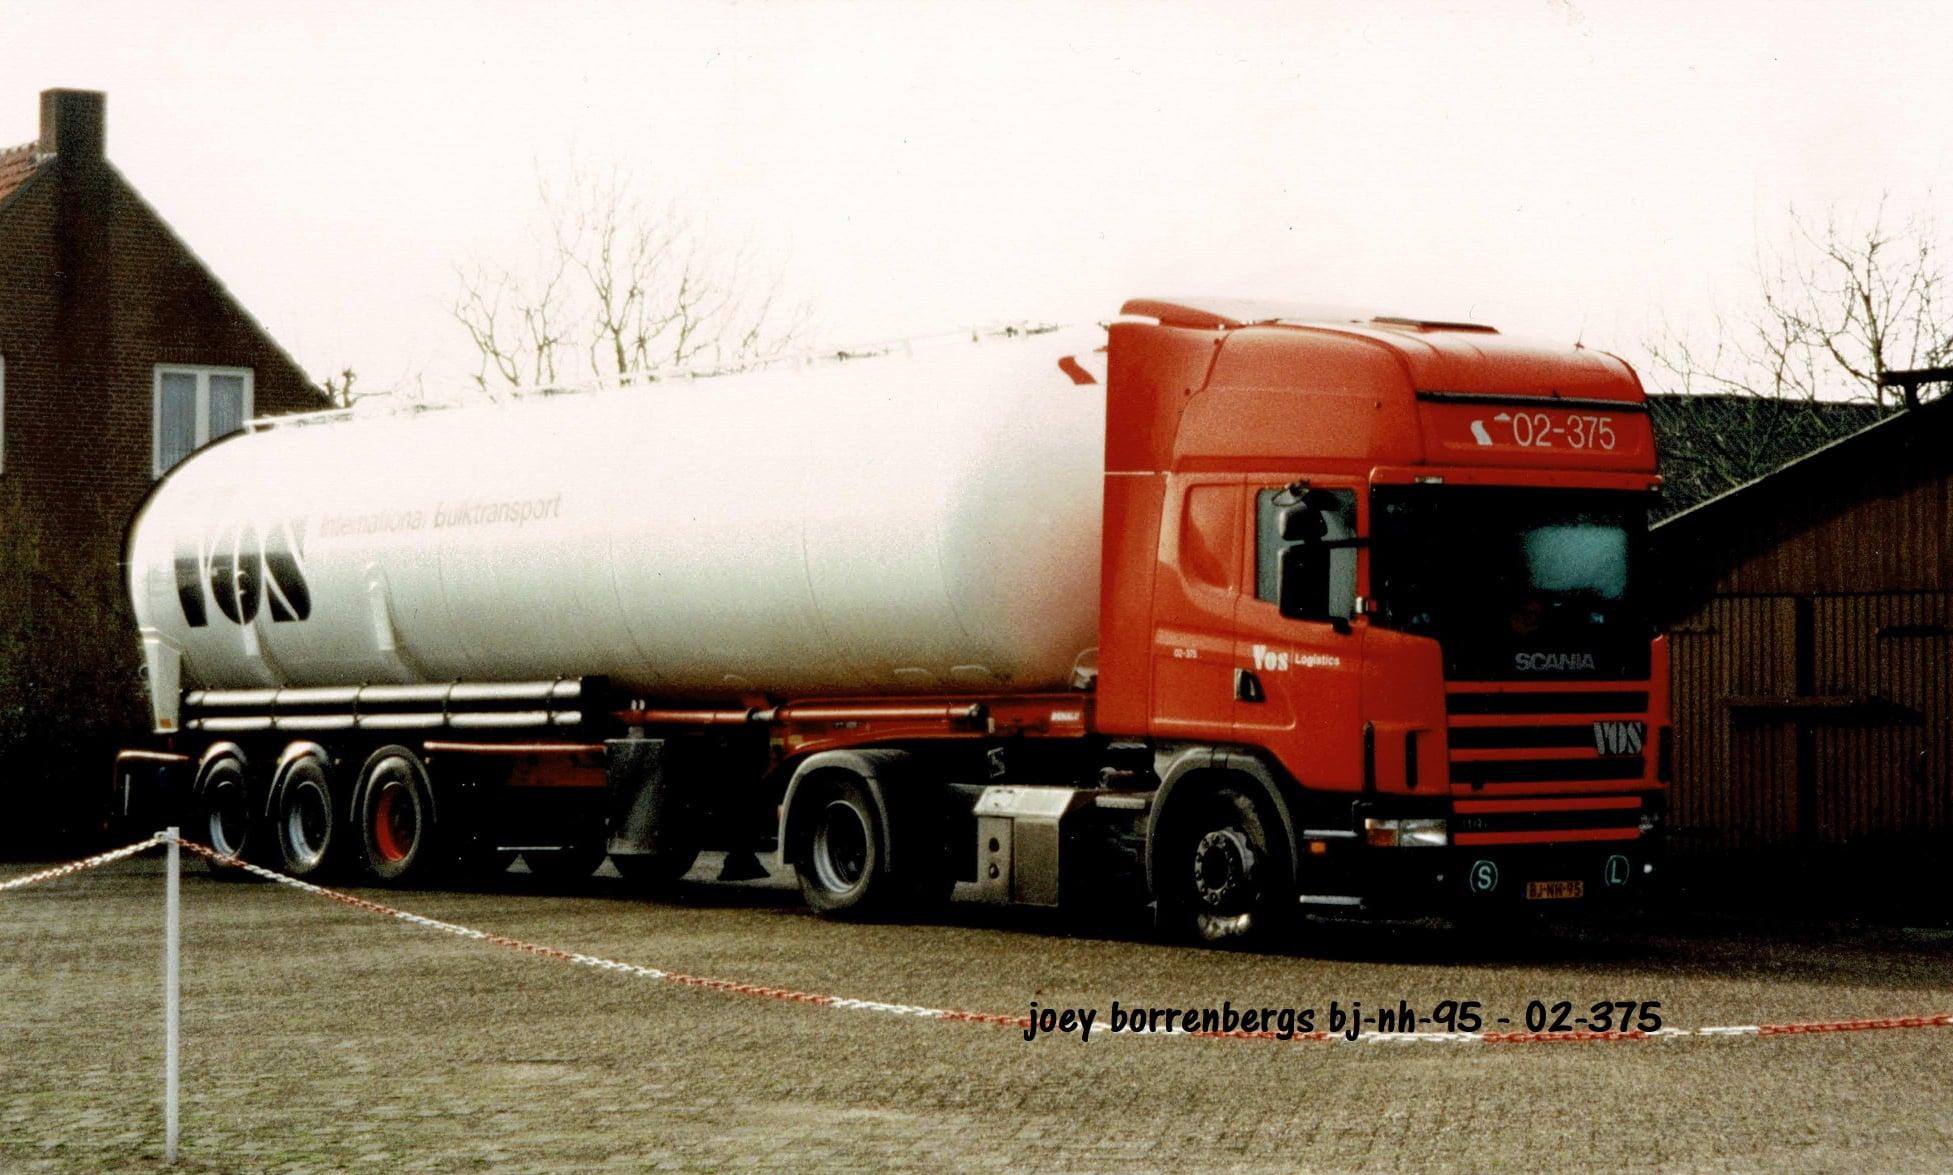 Luyksgestel-bj-nh-95-vlootnummer-02-375